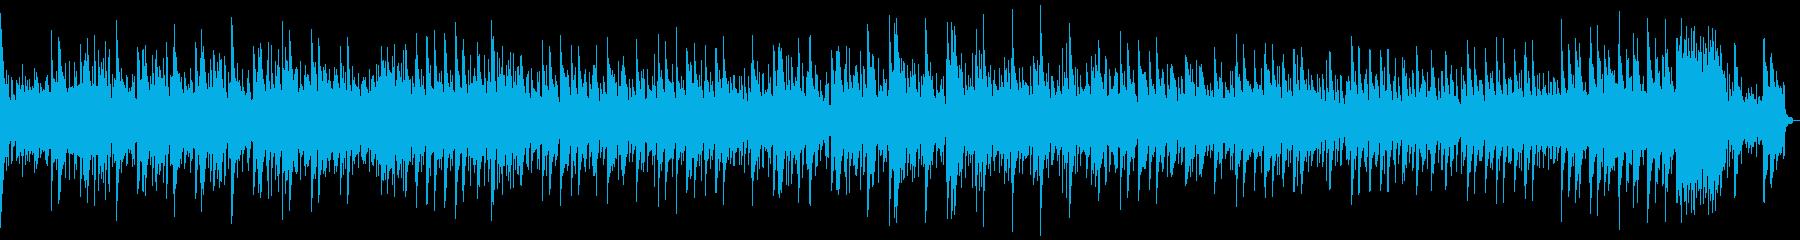 8bit 冒険の旅へ ファンタジーBGMの再生済みの波形